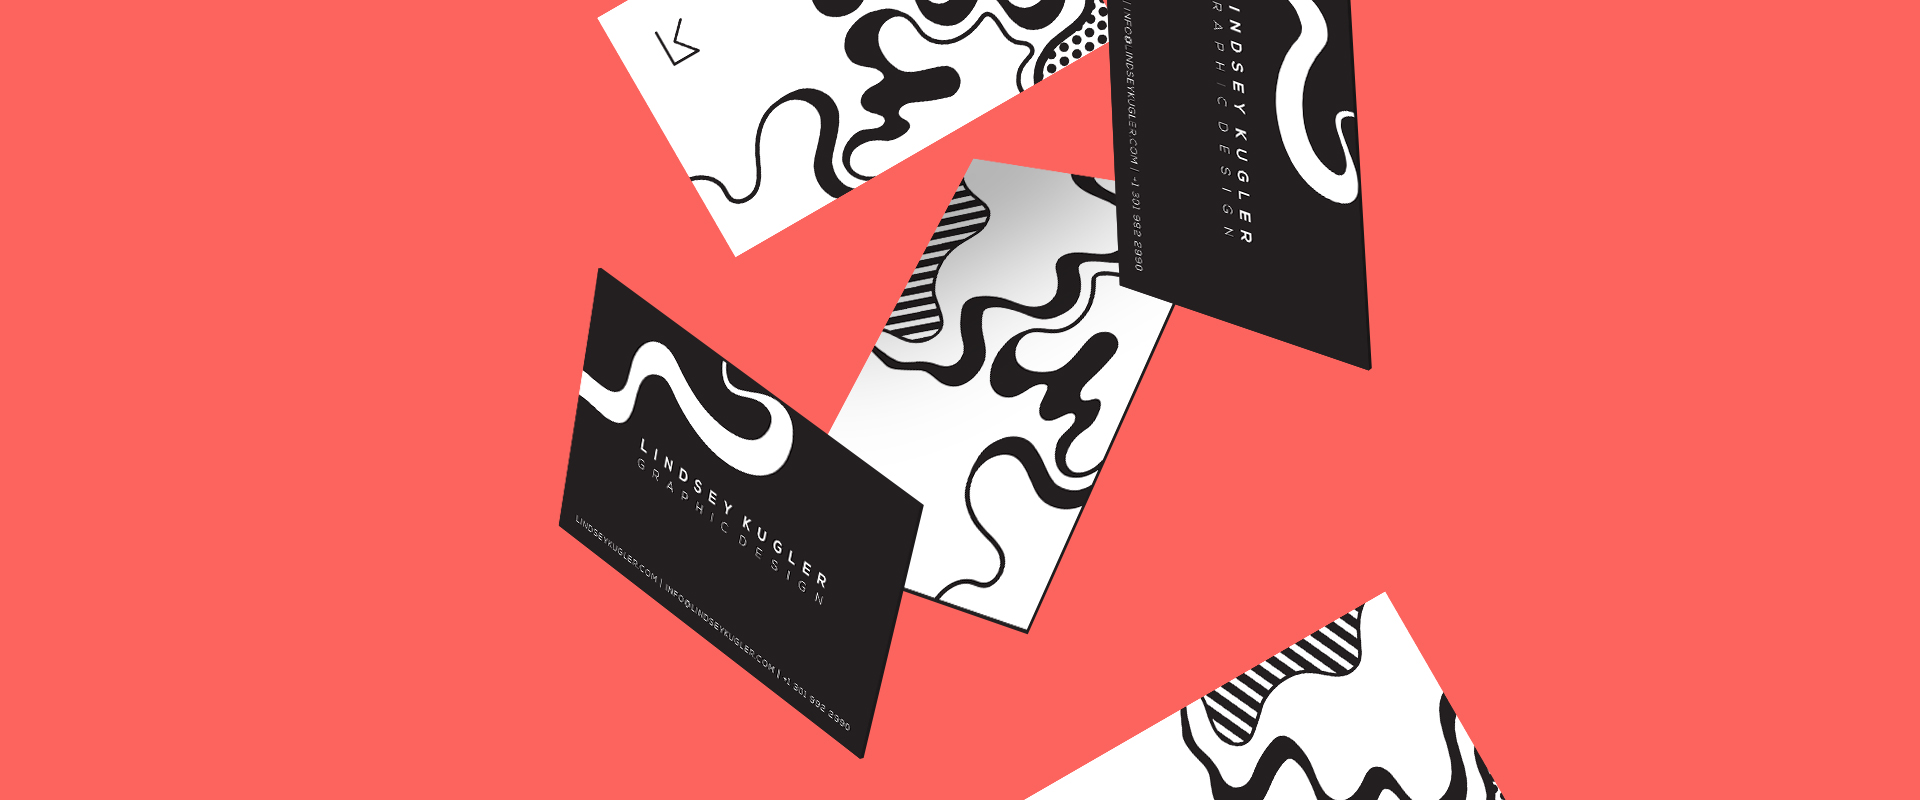 LindseyKuglerGraphicDesign_BusinessCards_04.jpg